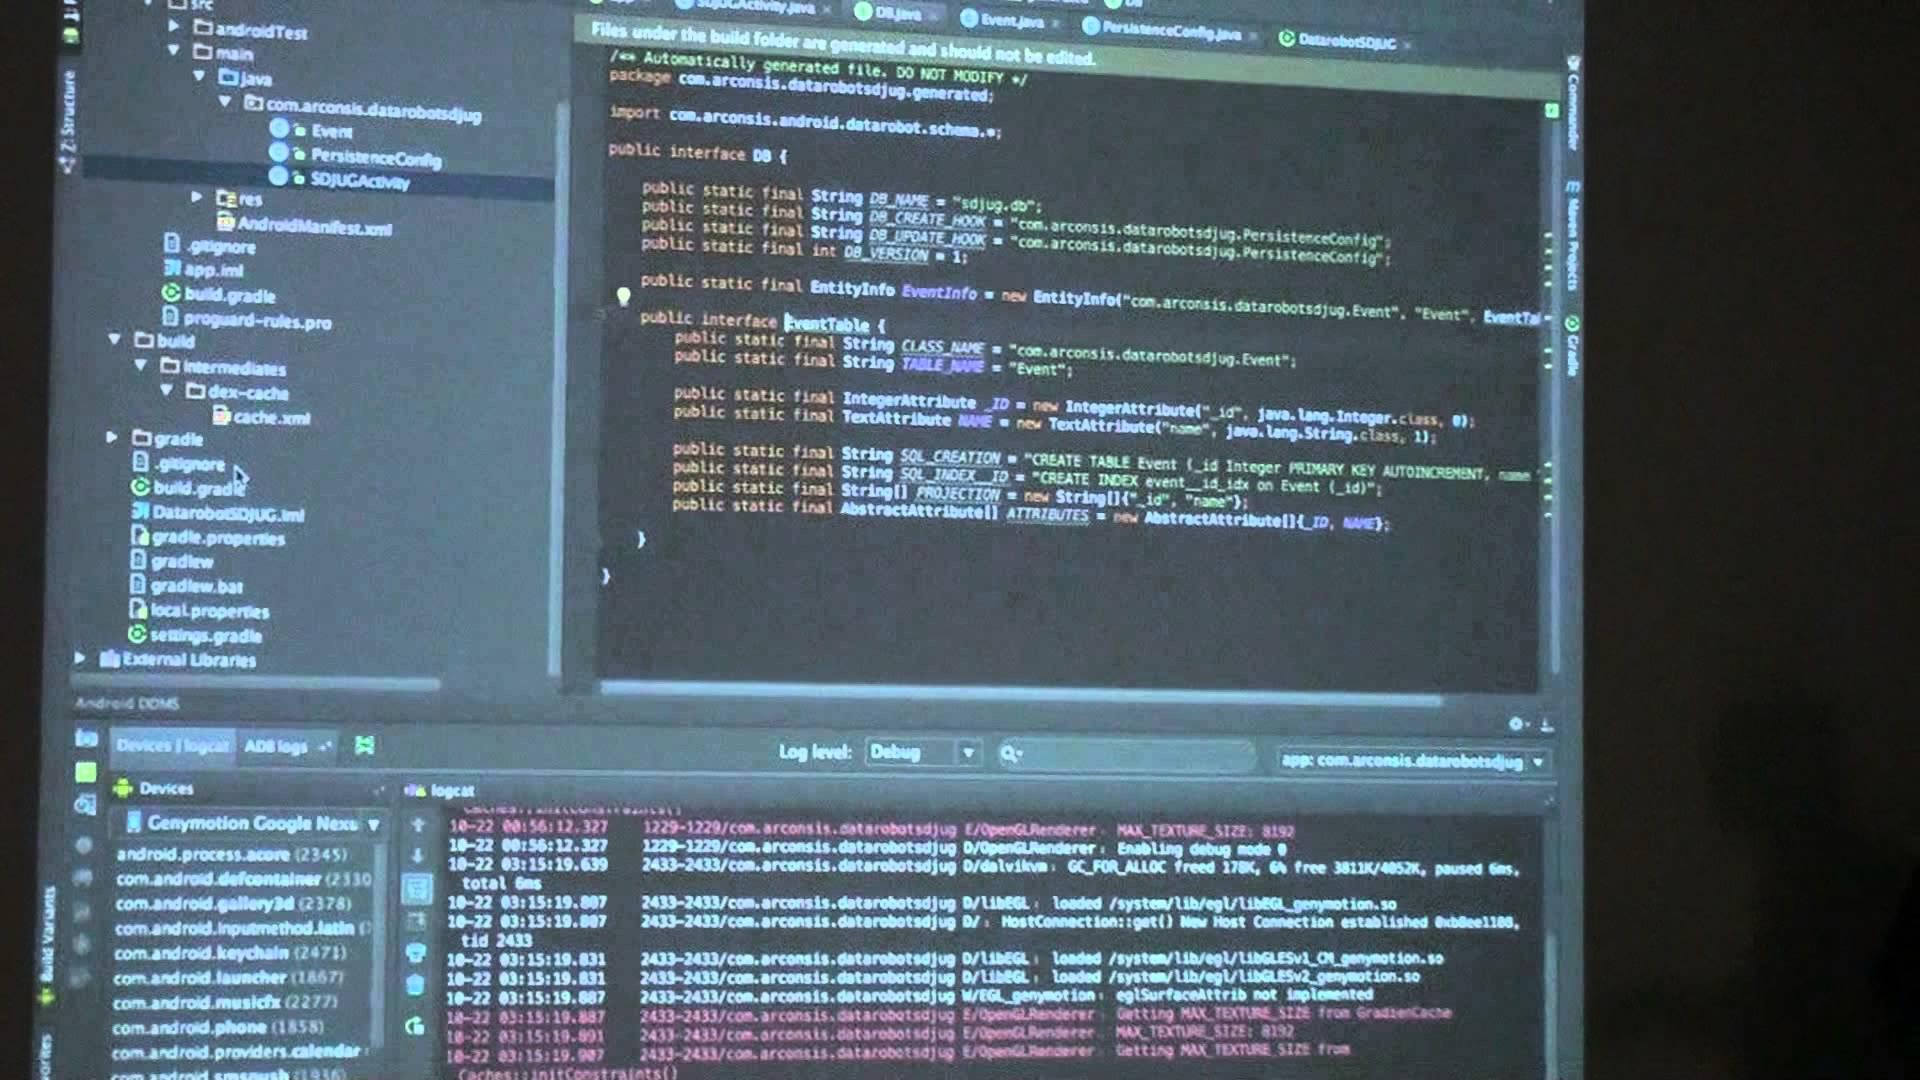 DataRobot surpass 110 million predictive models